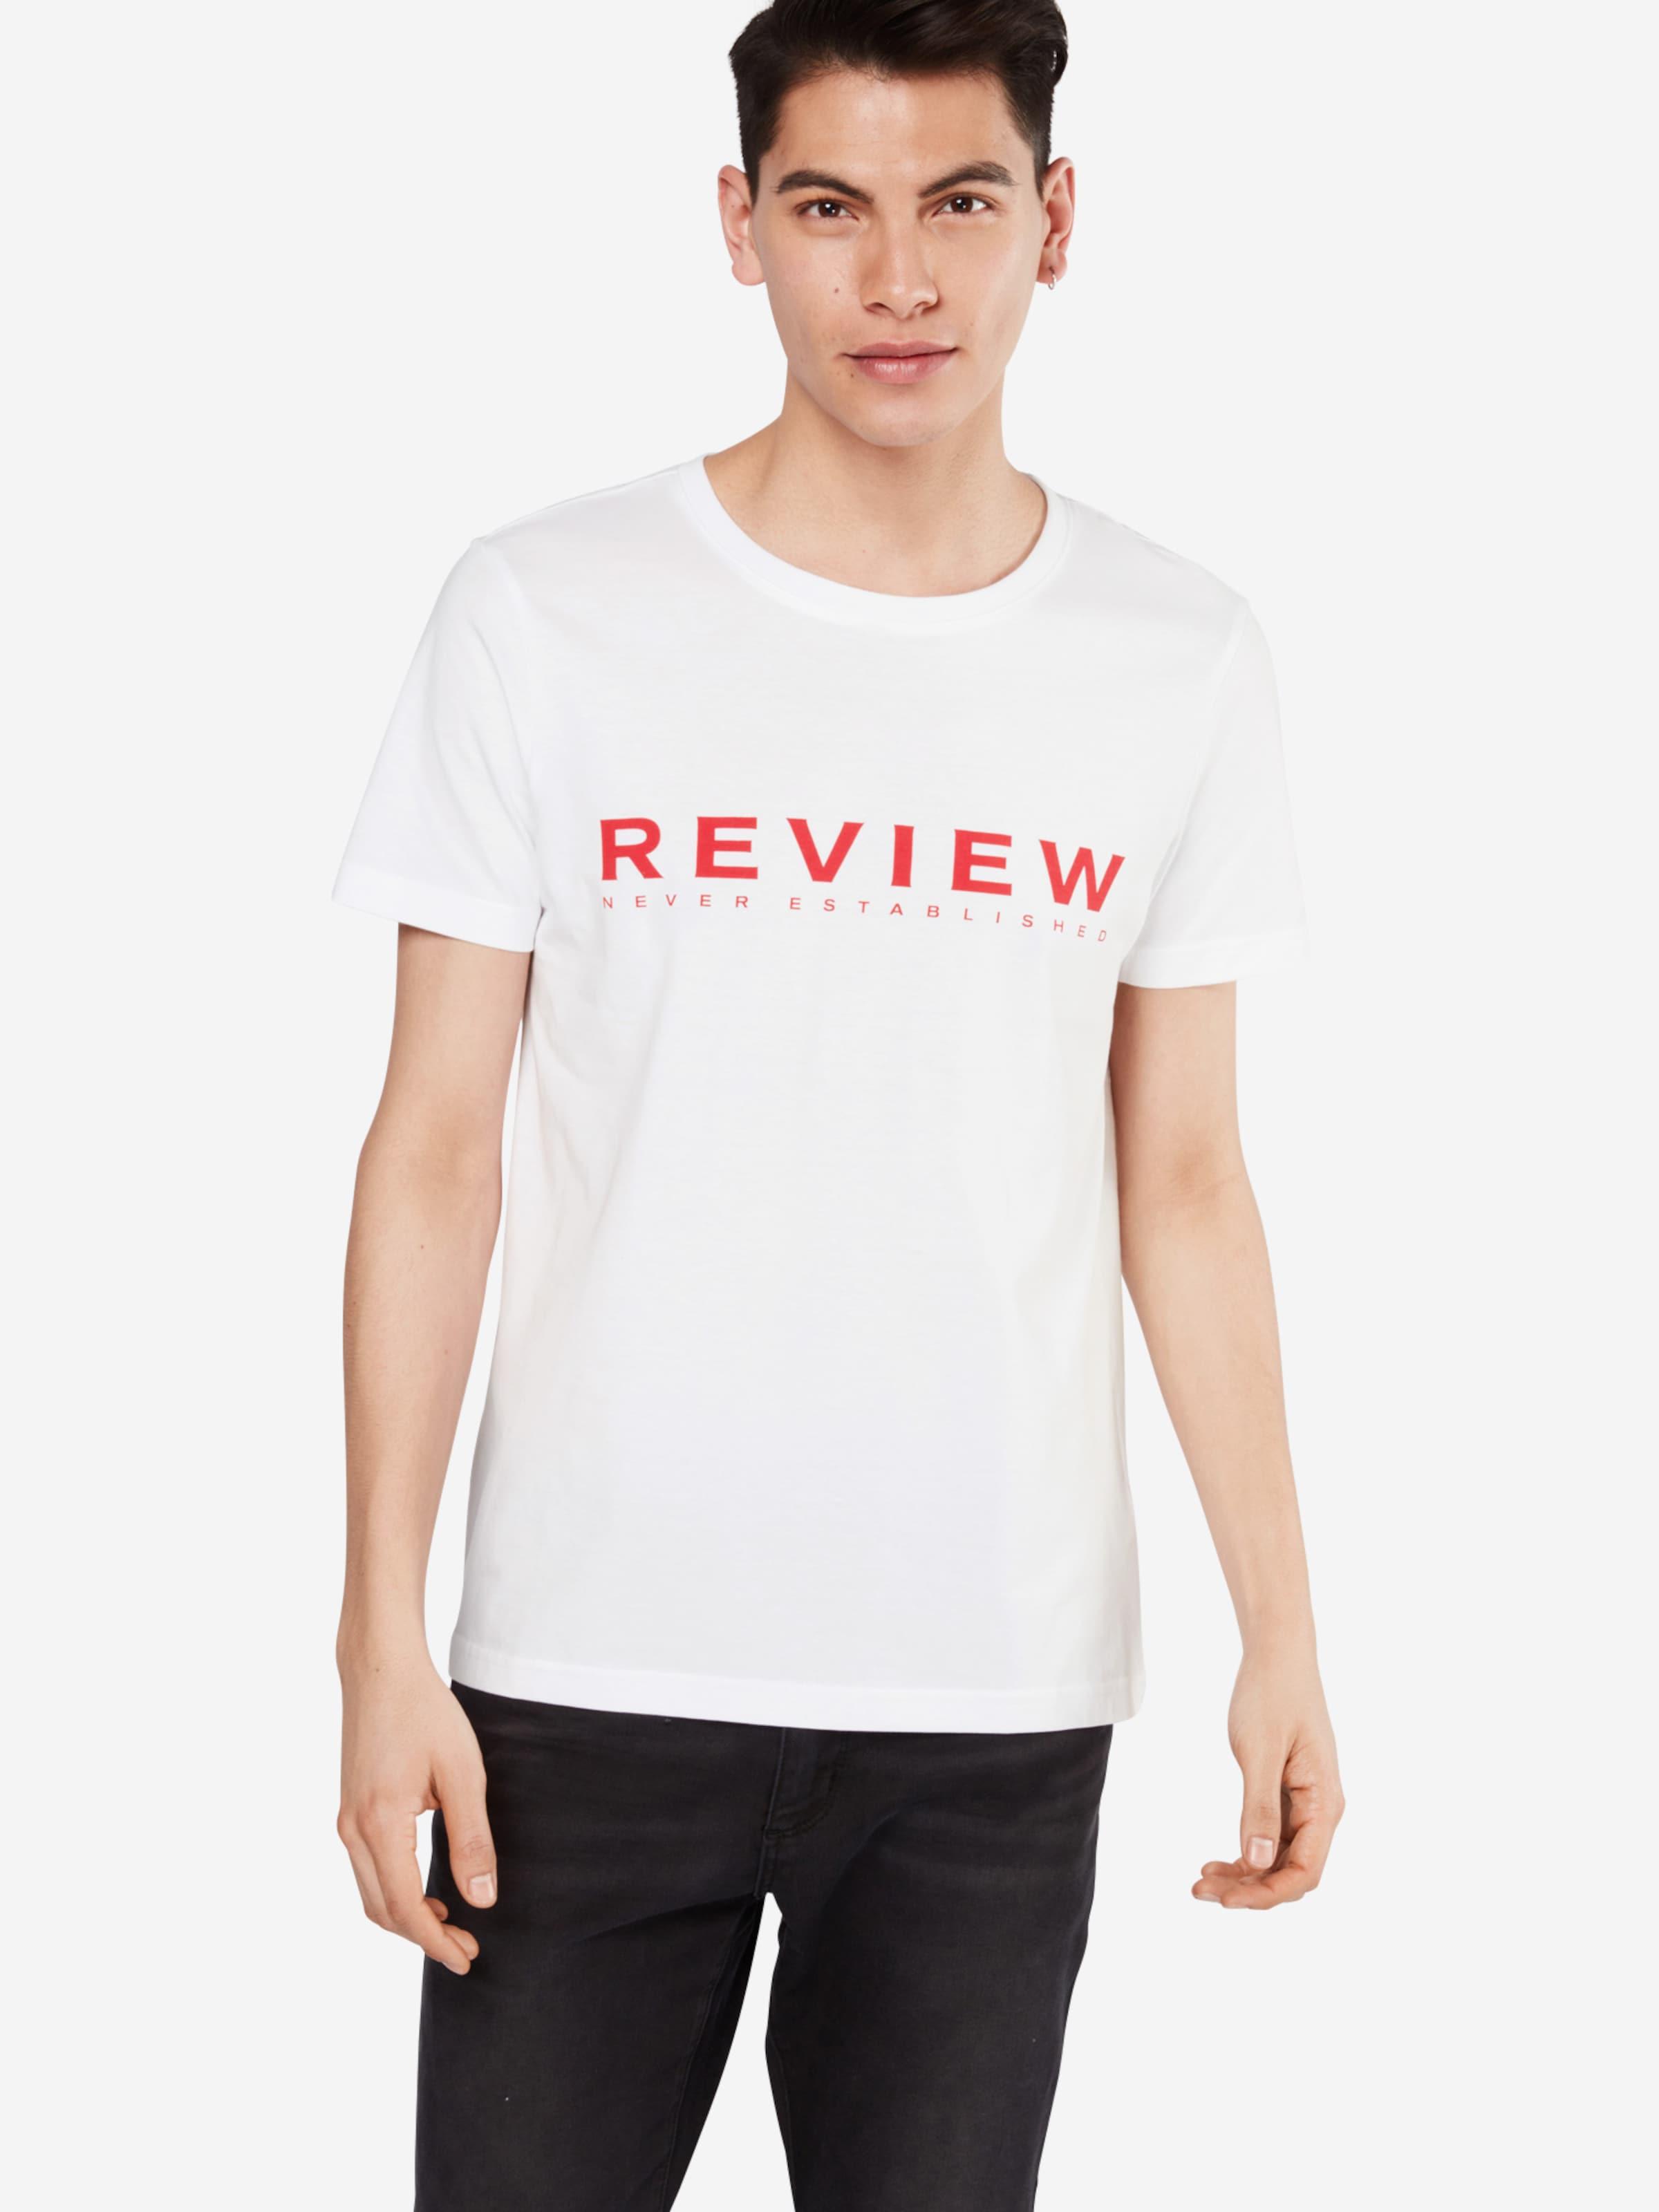 Review T-Shirt 'REVIEW TEE' Günstig Kaufen Zuverlässig DOD9J